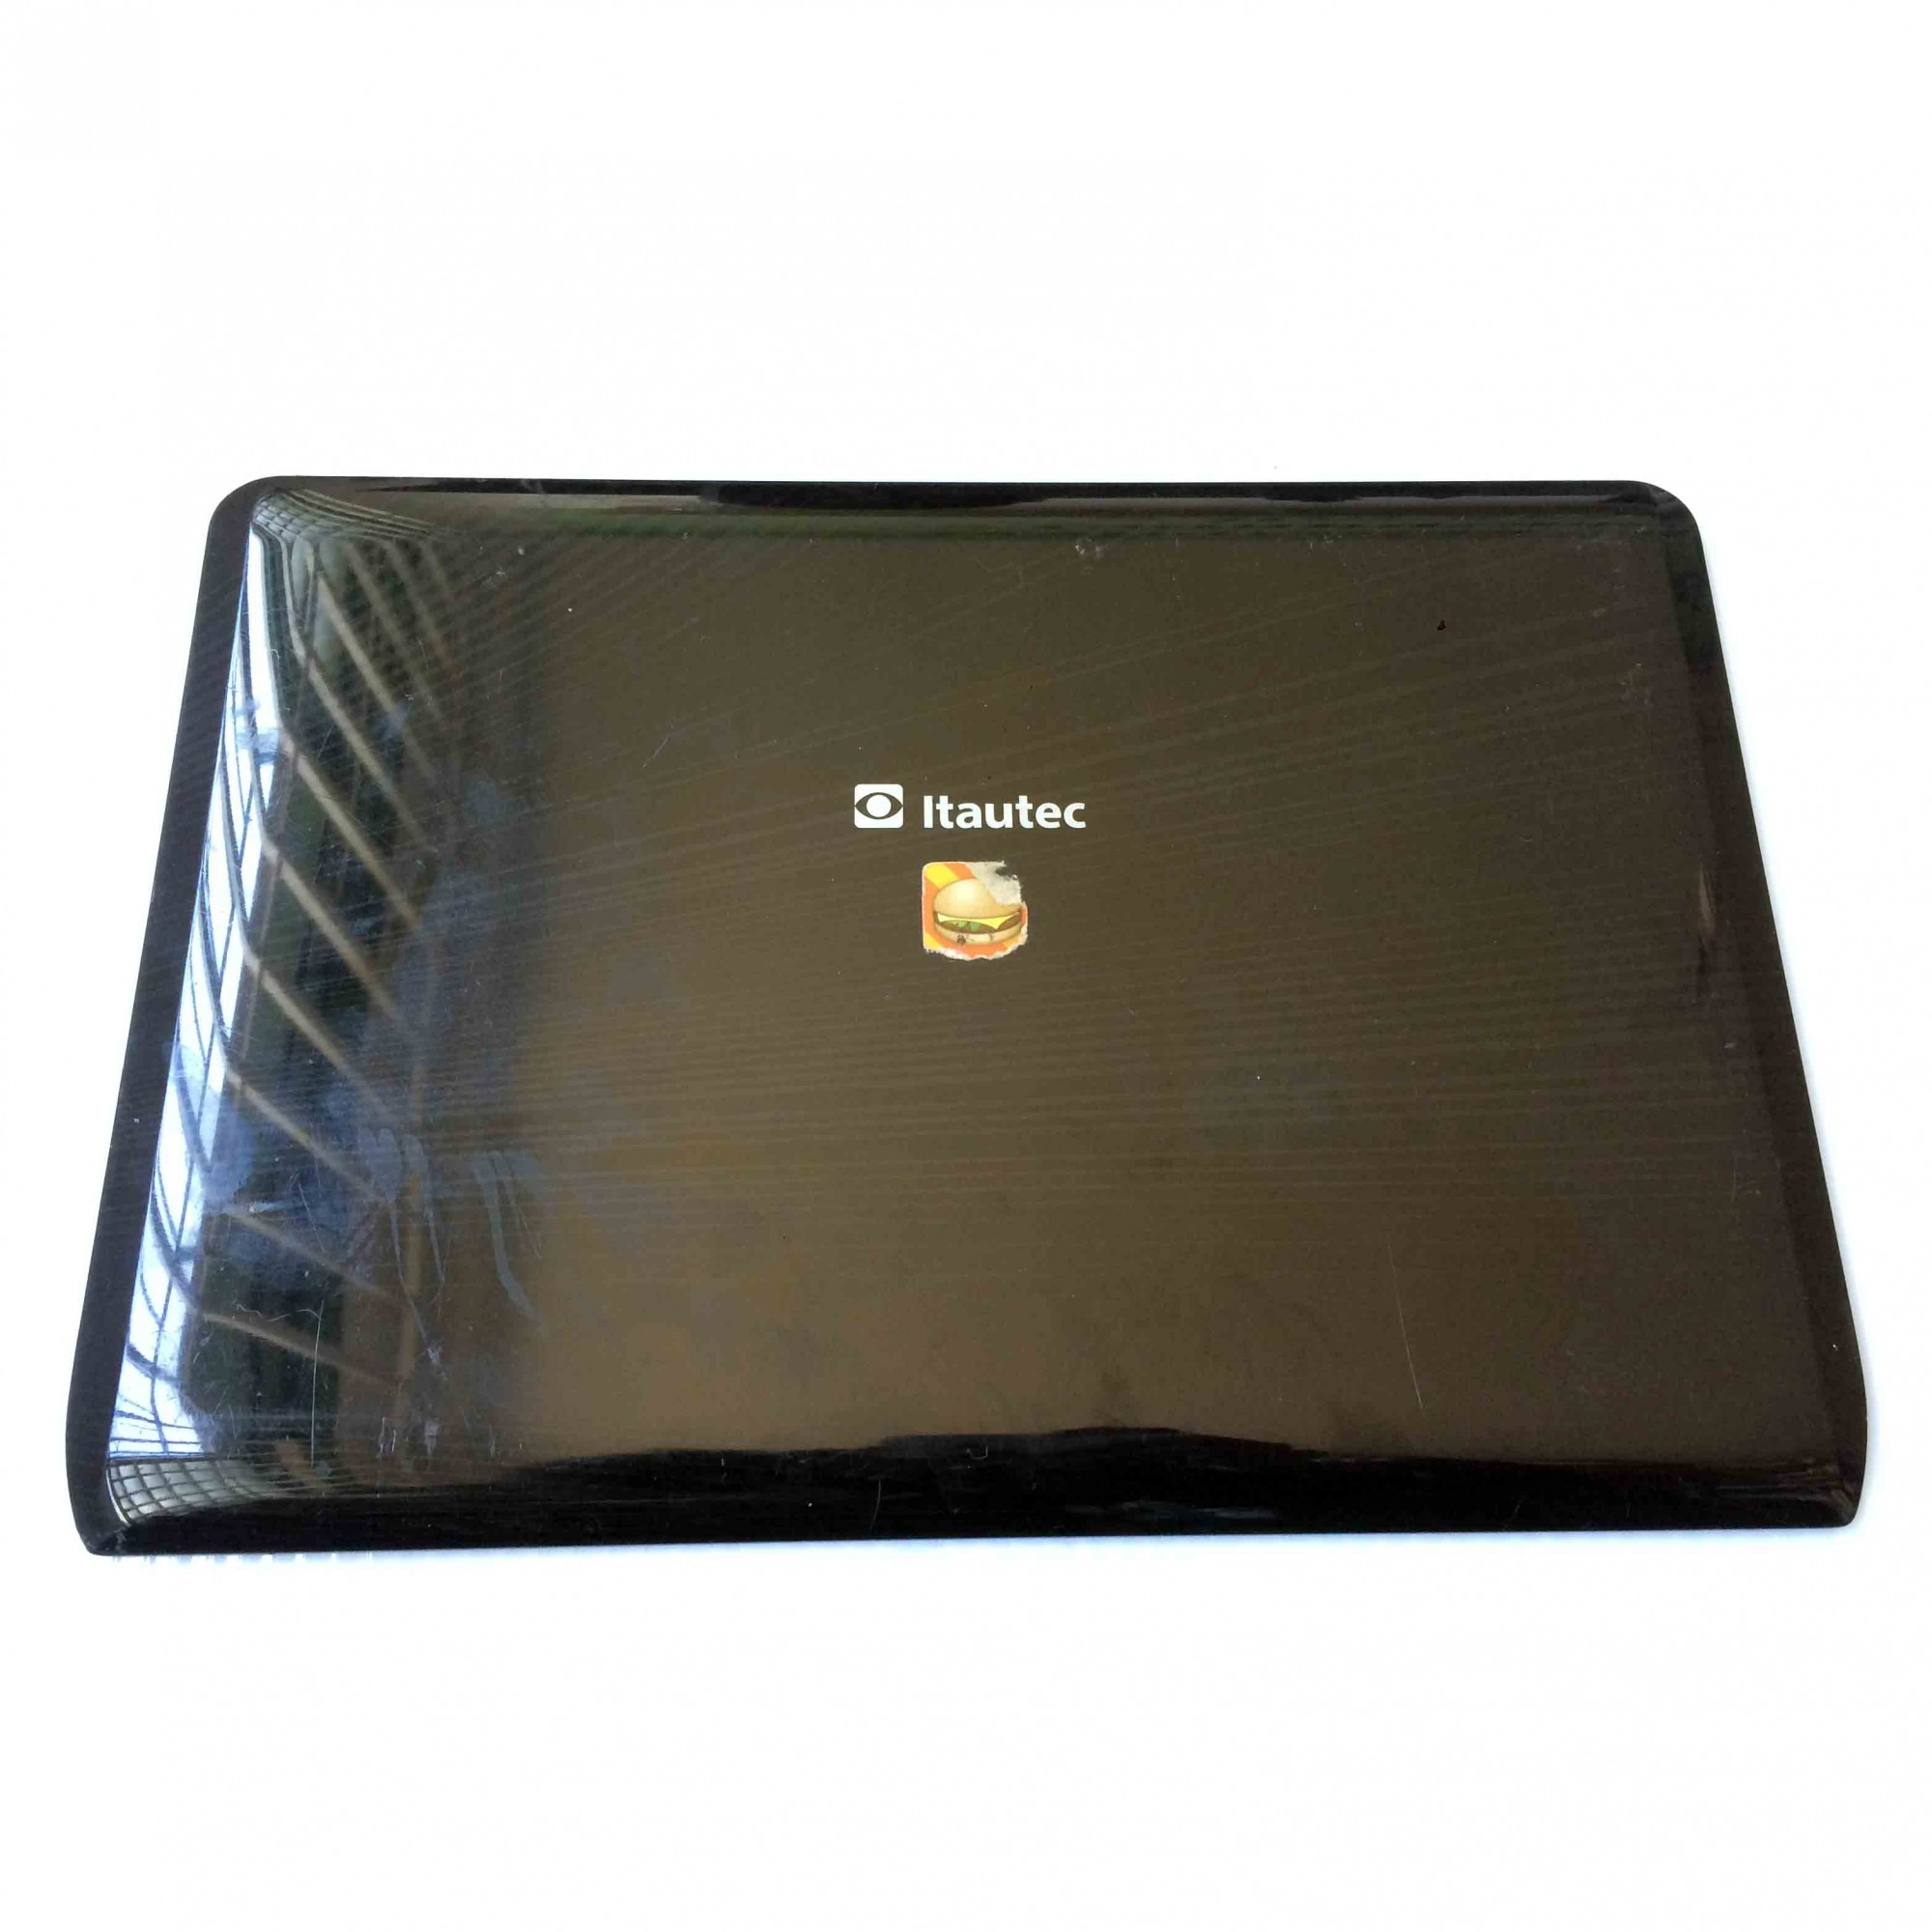 Carcaça Tampa LCD Notebook Itautec Infoway W7435 14 Pol. PN:Easw9007010 - Retirado